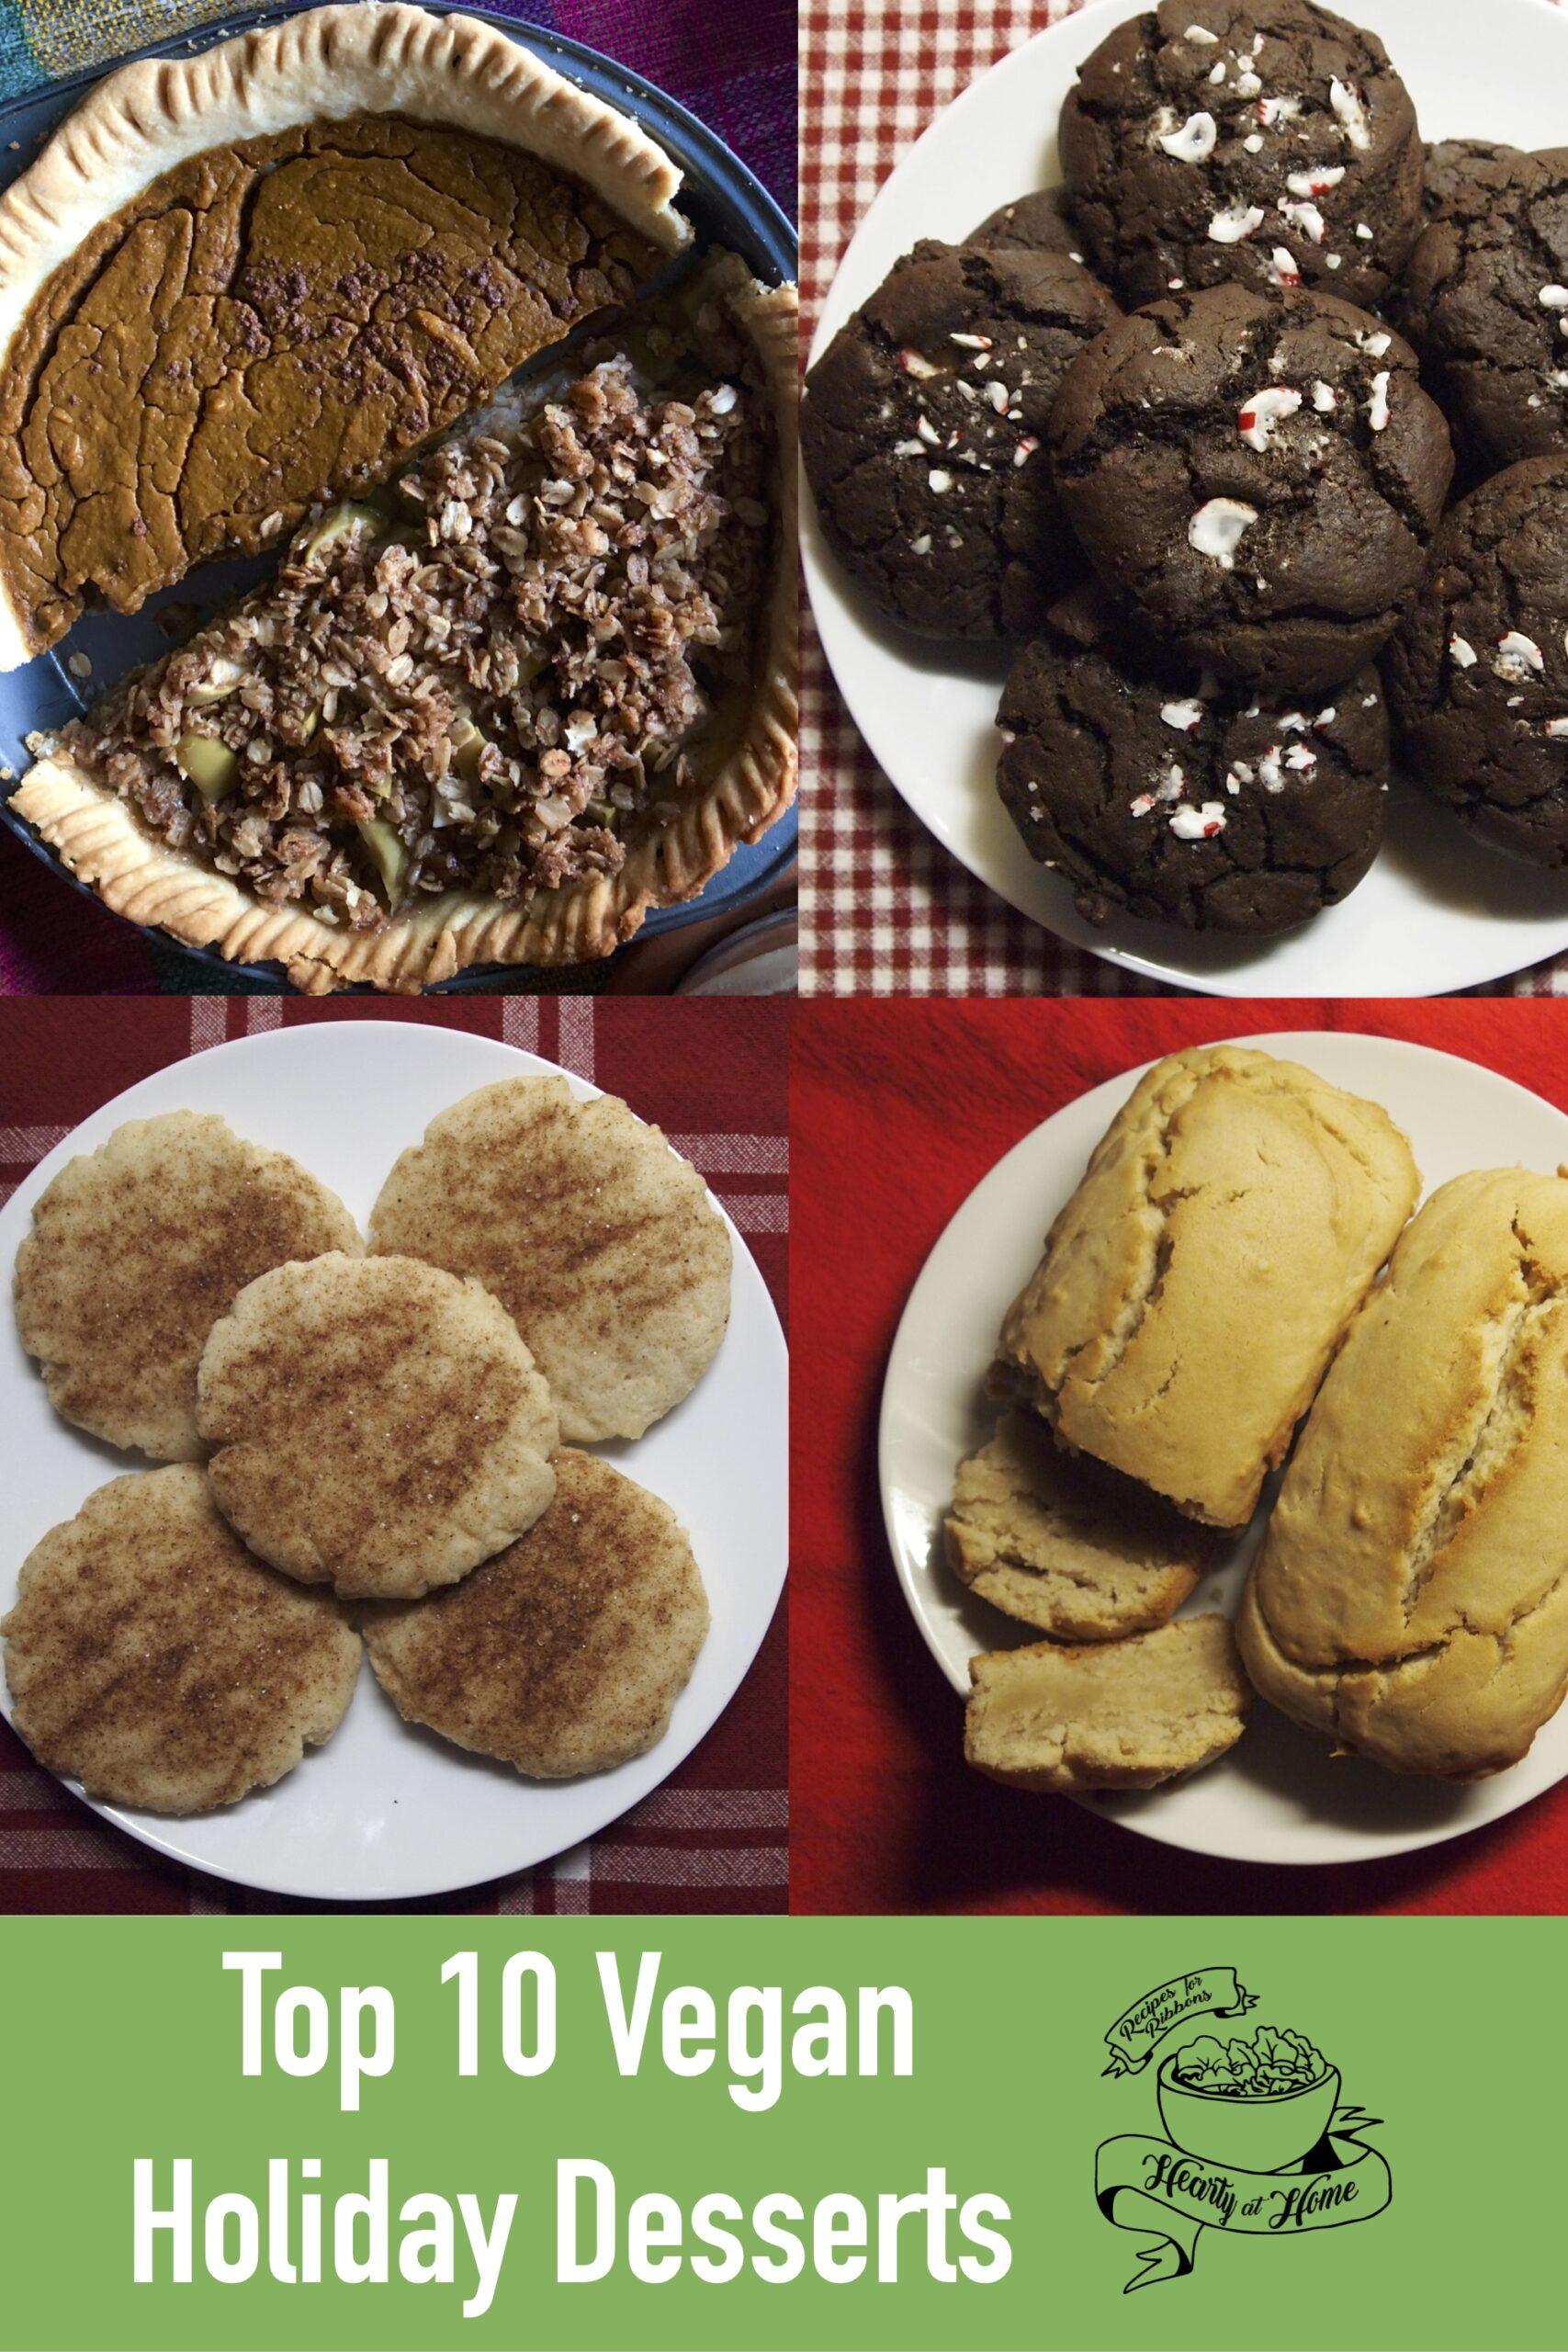 Top 10 Vegan Holiday Desserts